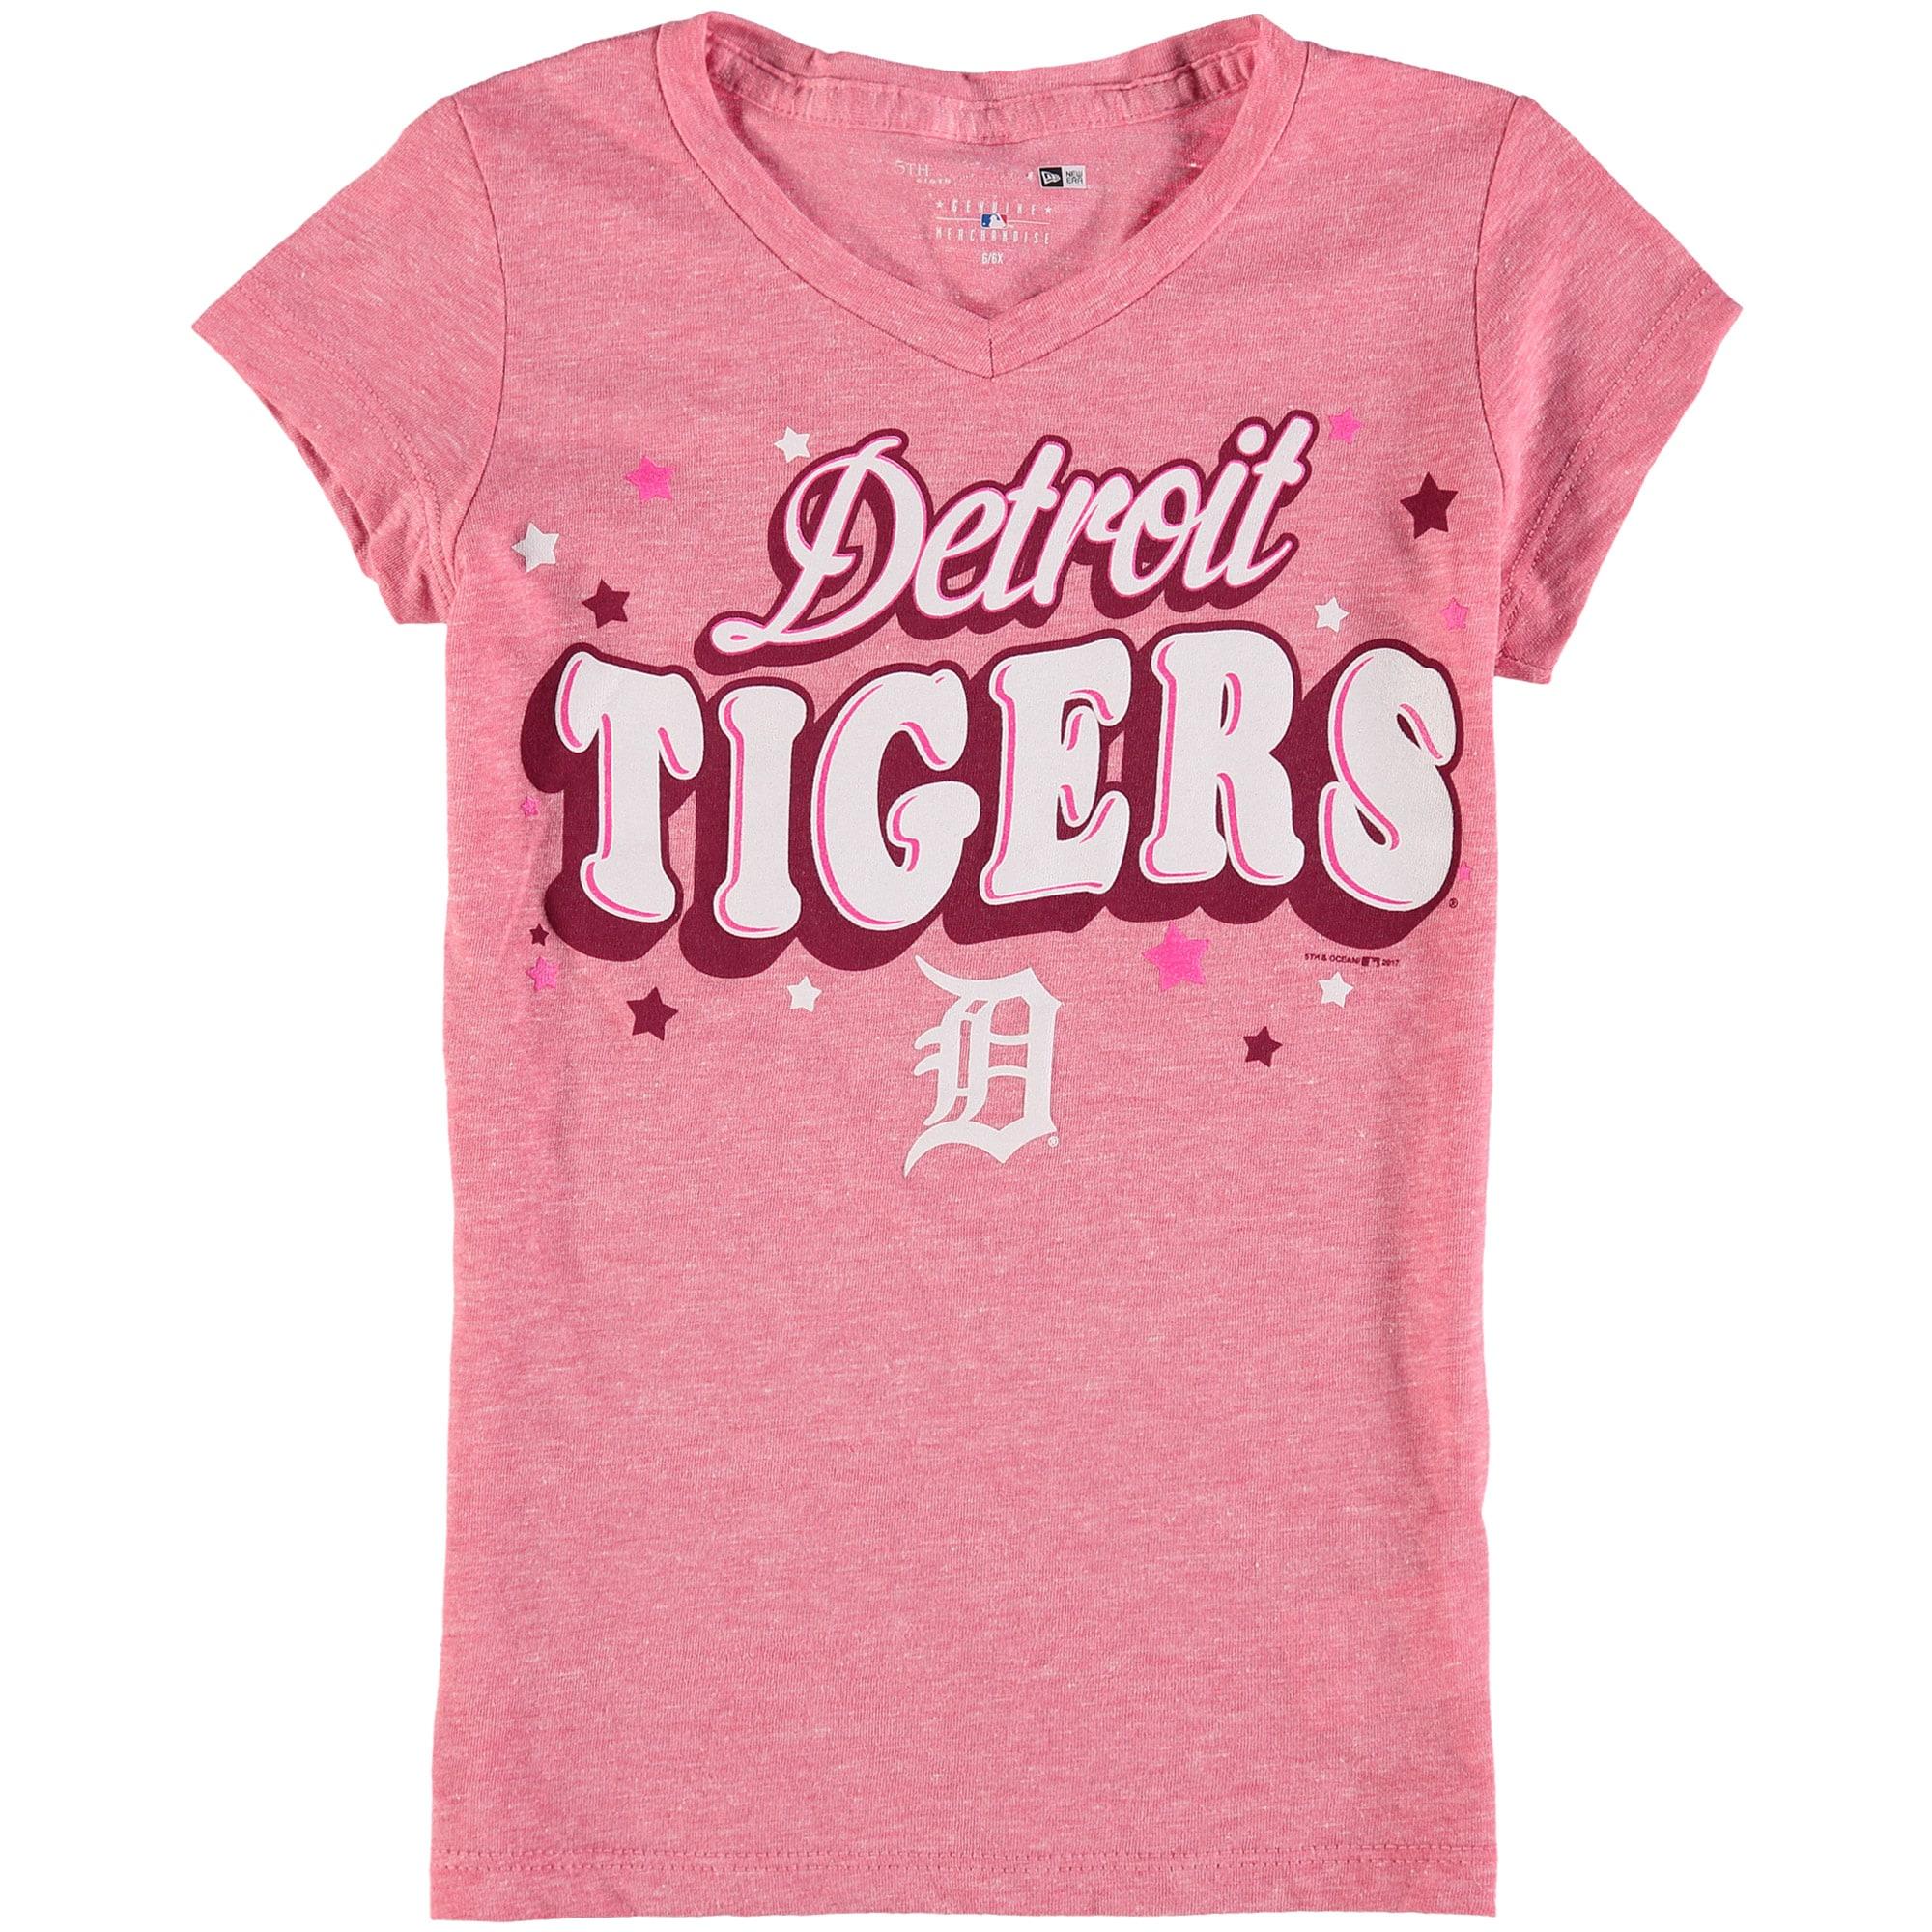 Detroit Tigers 5th & Ocean by New Era Girls Youth Stars Tri-Blend V-Neck T-Shirt - Pink